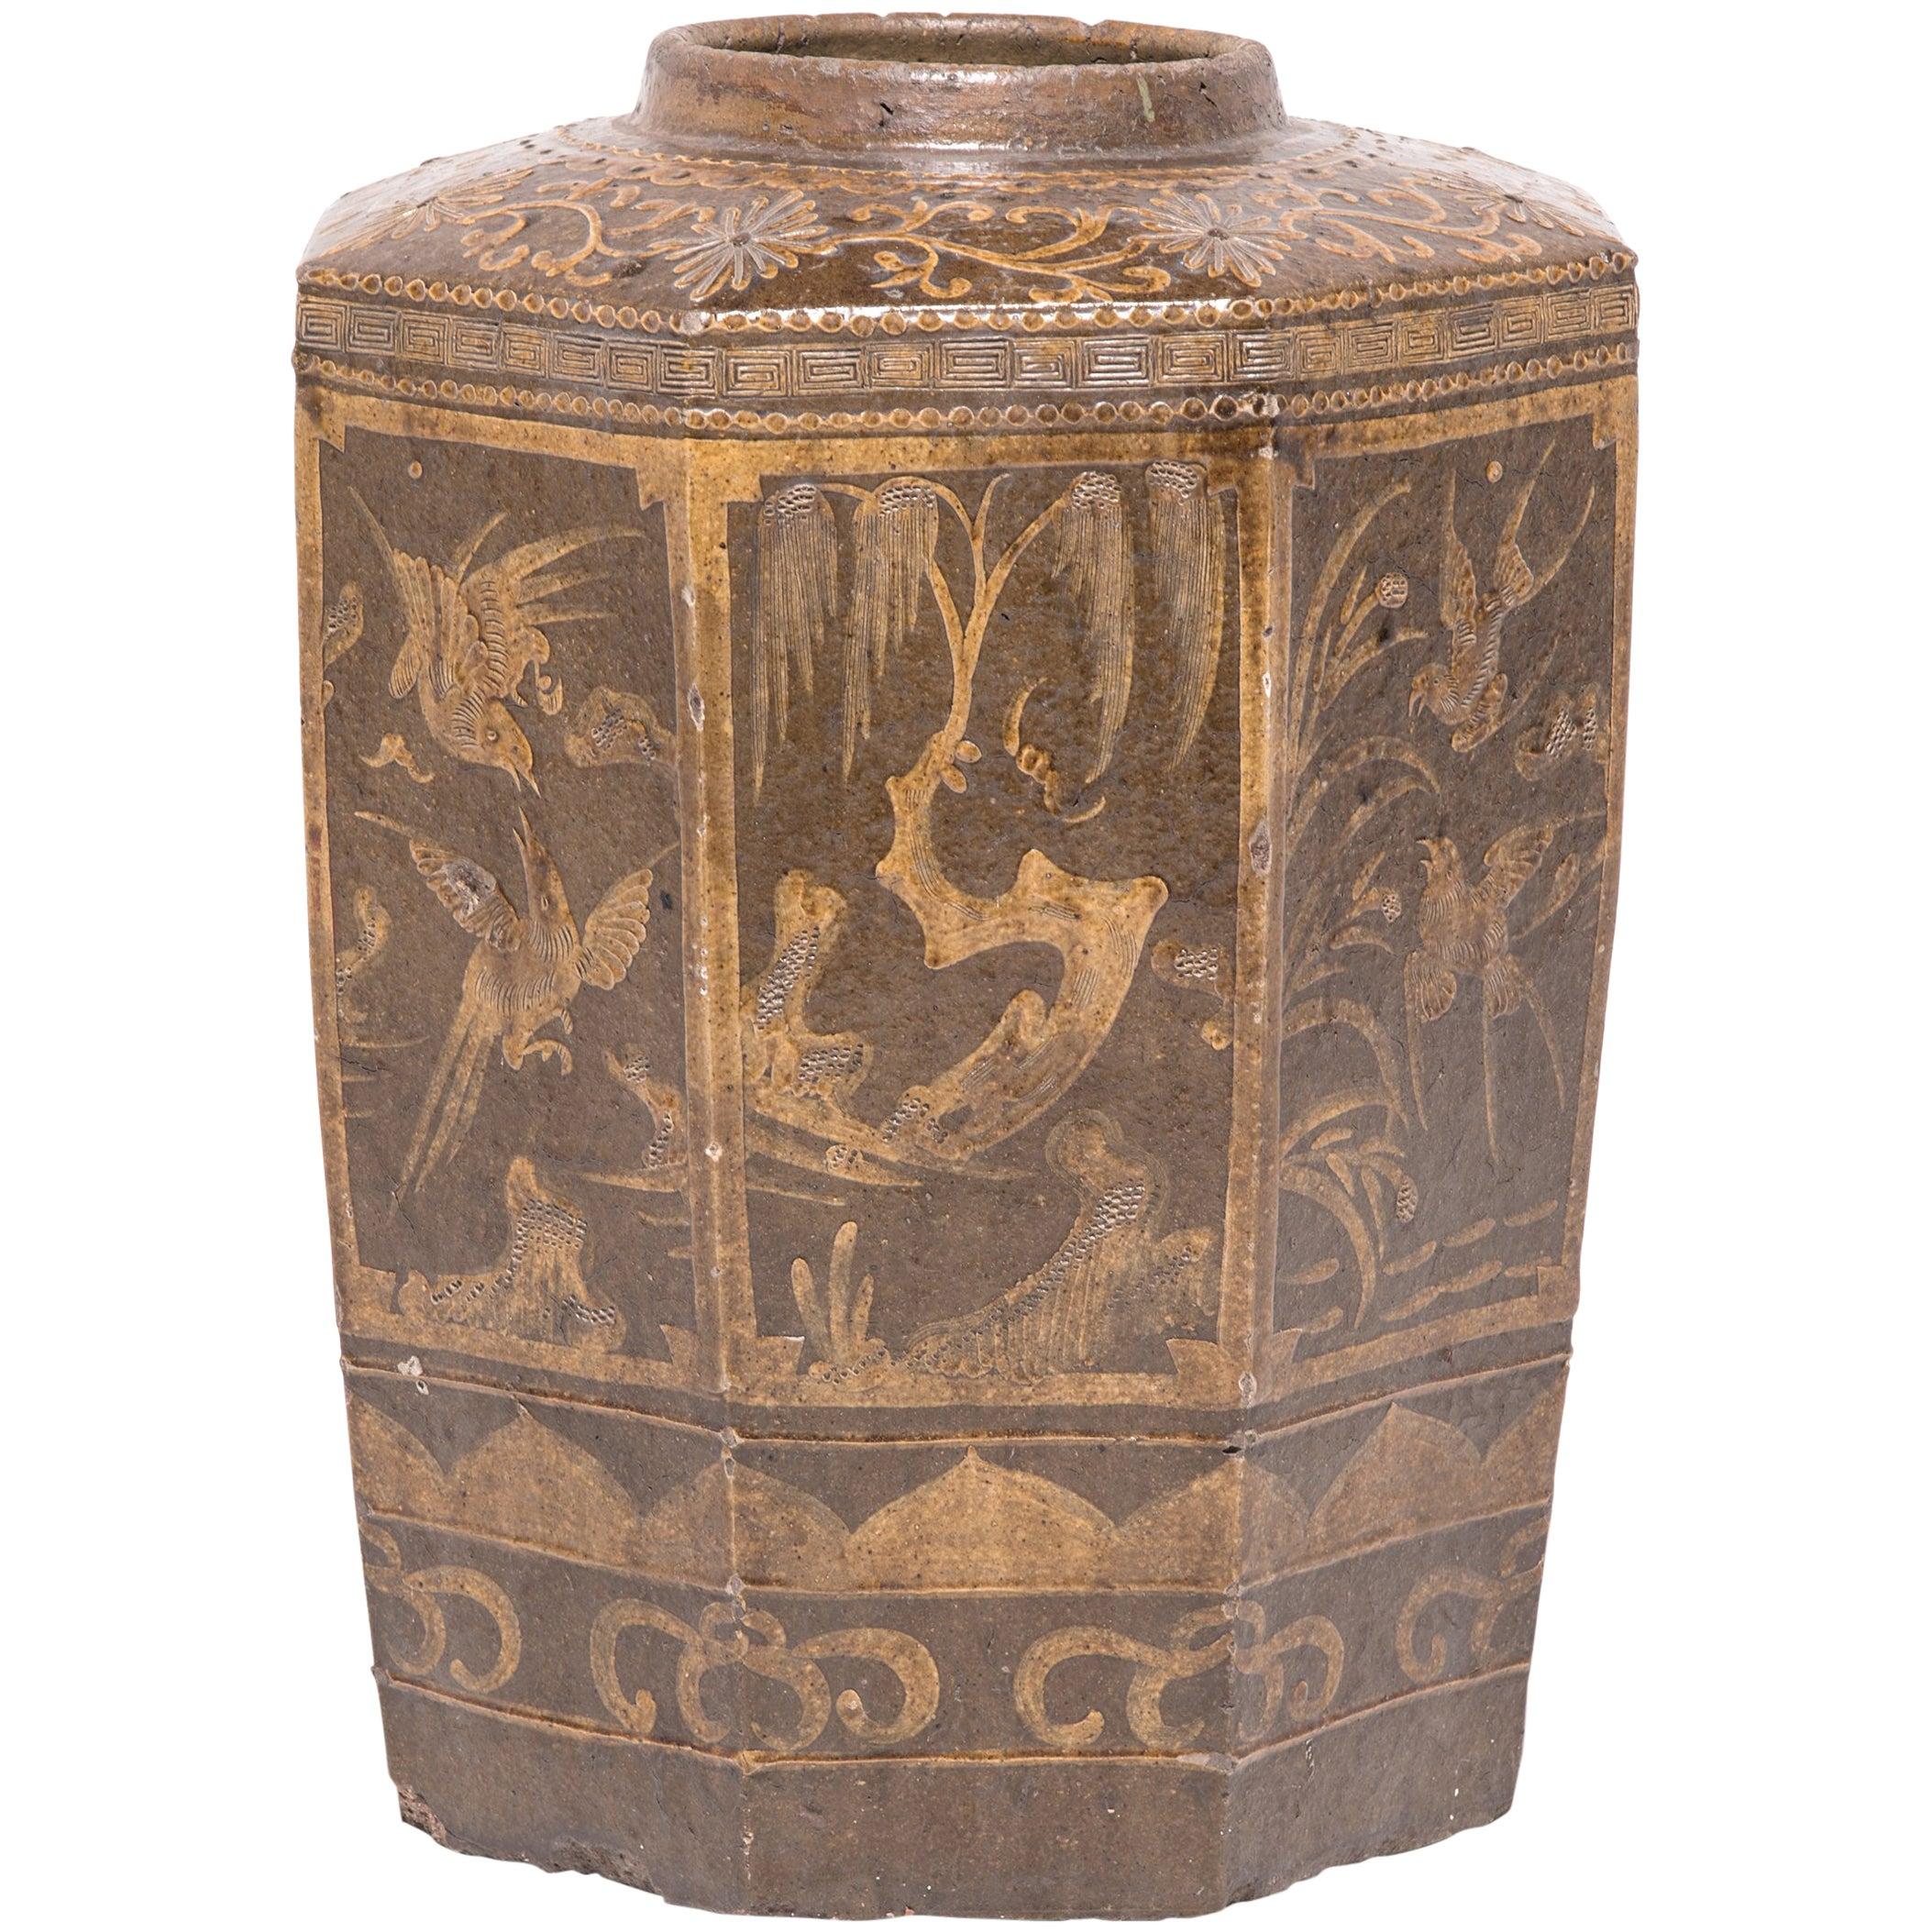 19th Century Chinese Glazed Pickling Pot